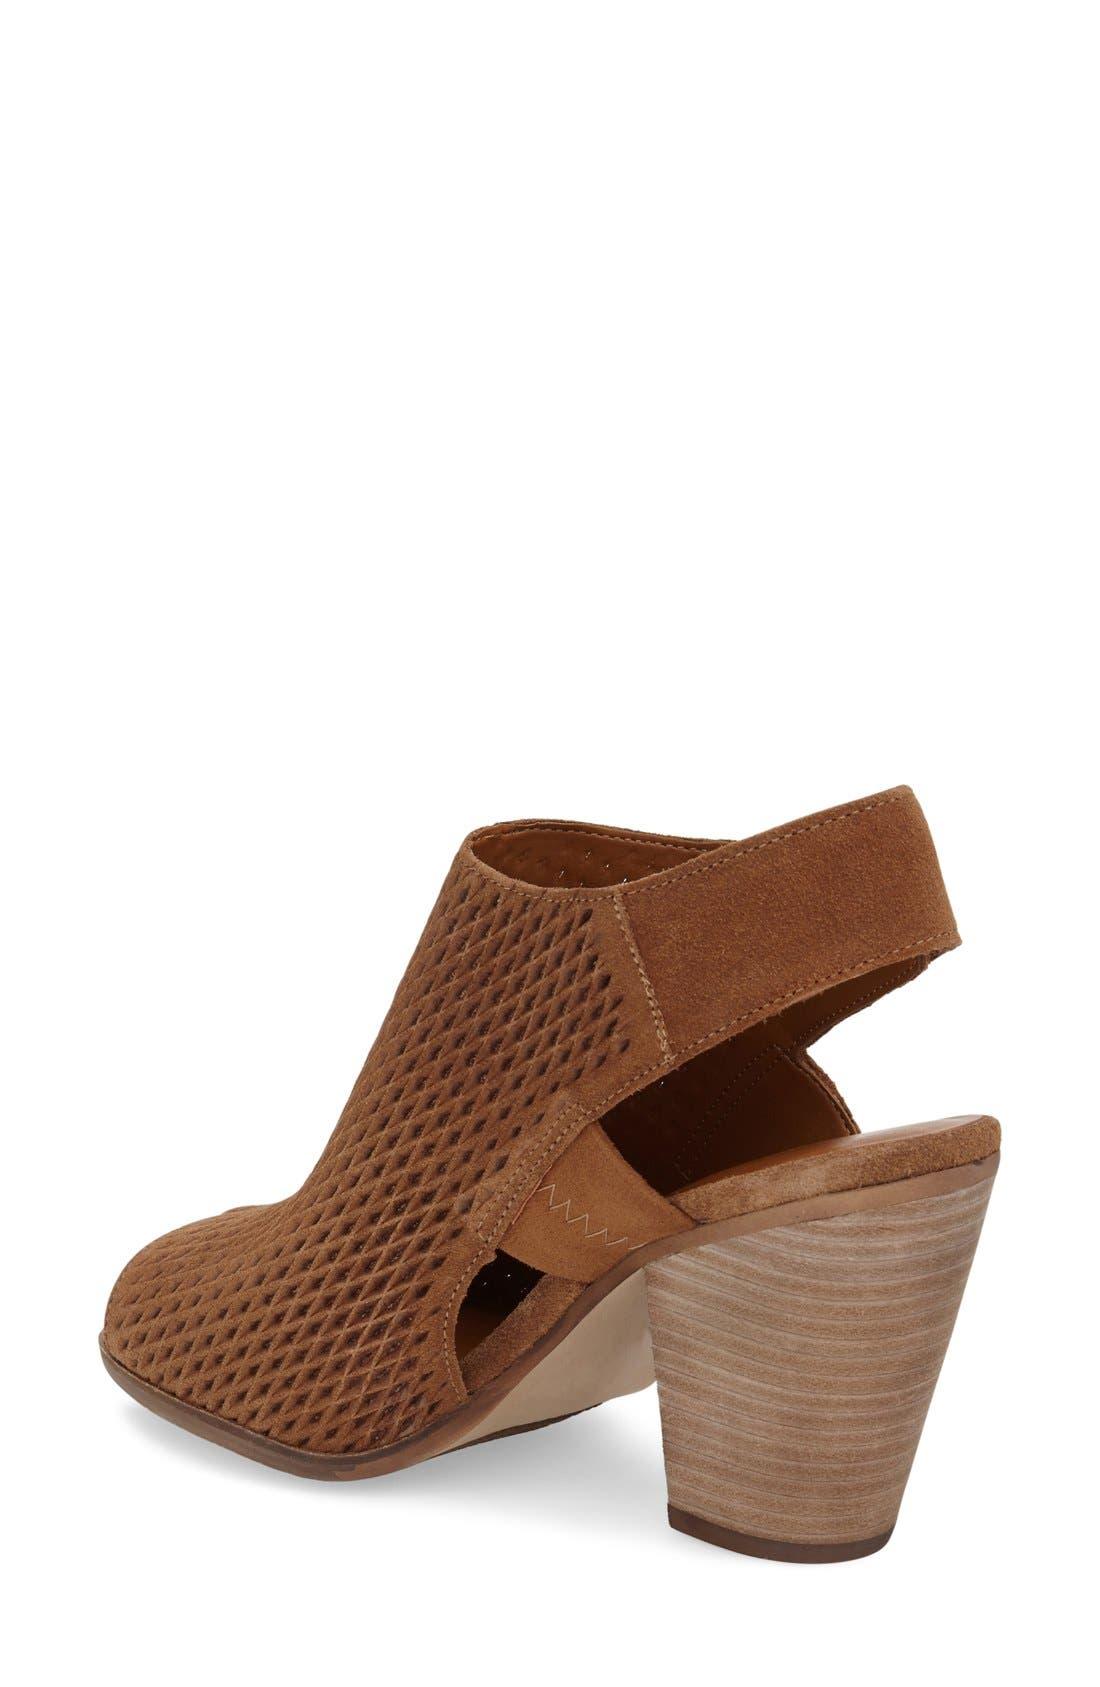 'Janel' Perforated Slingback Sandal,                             Alternate thumbnail 3, color,                             201